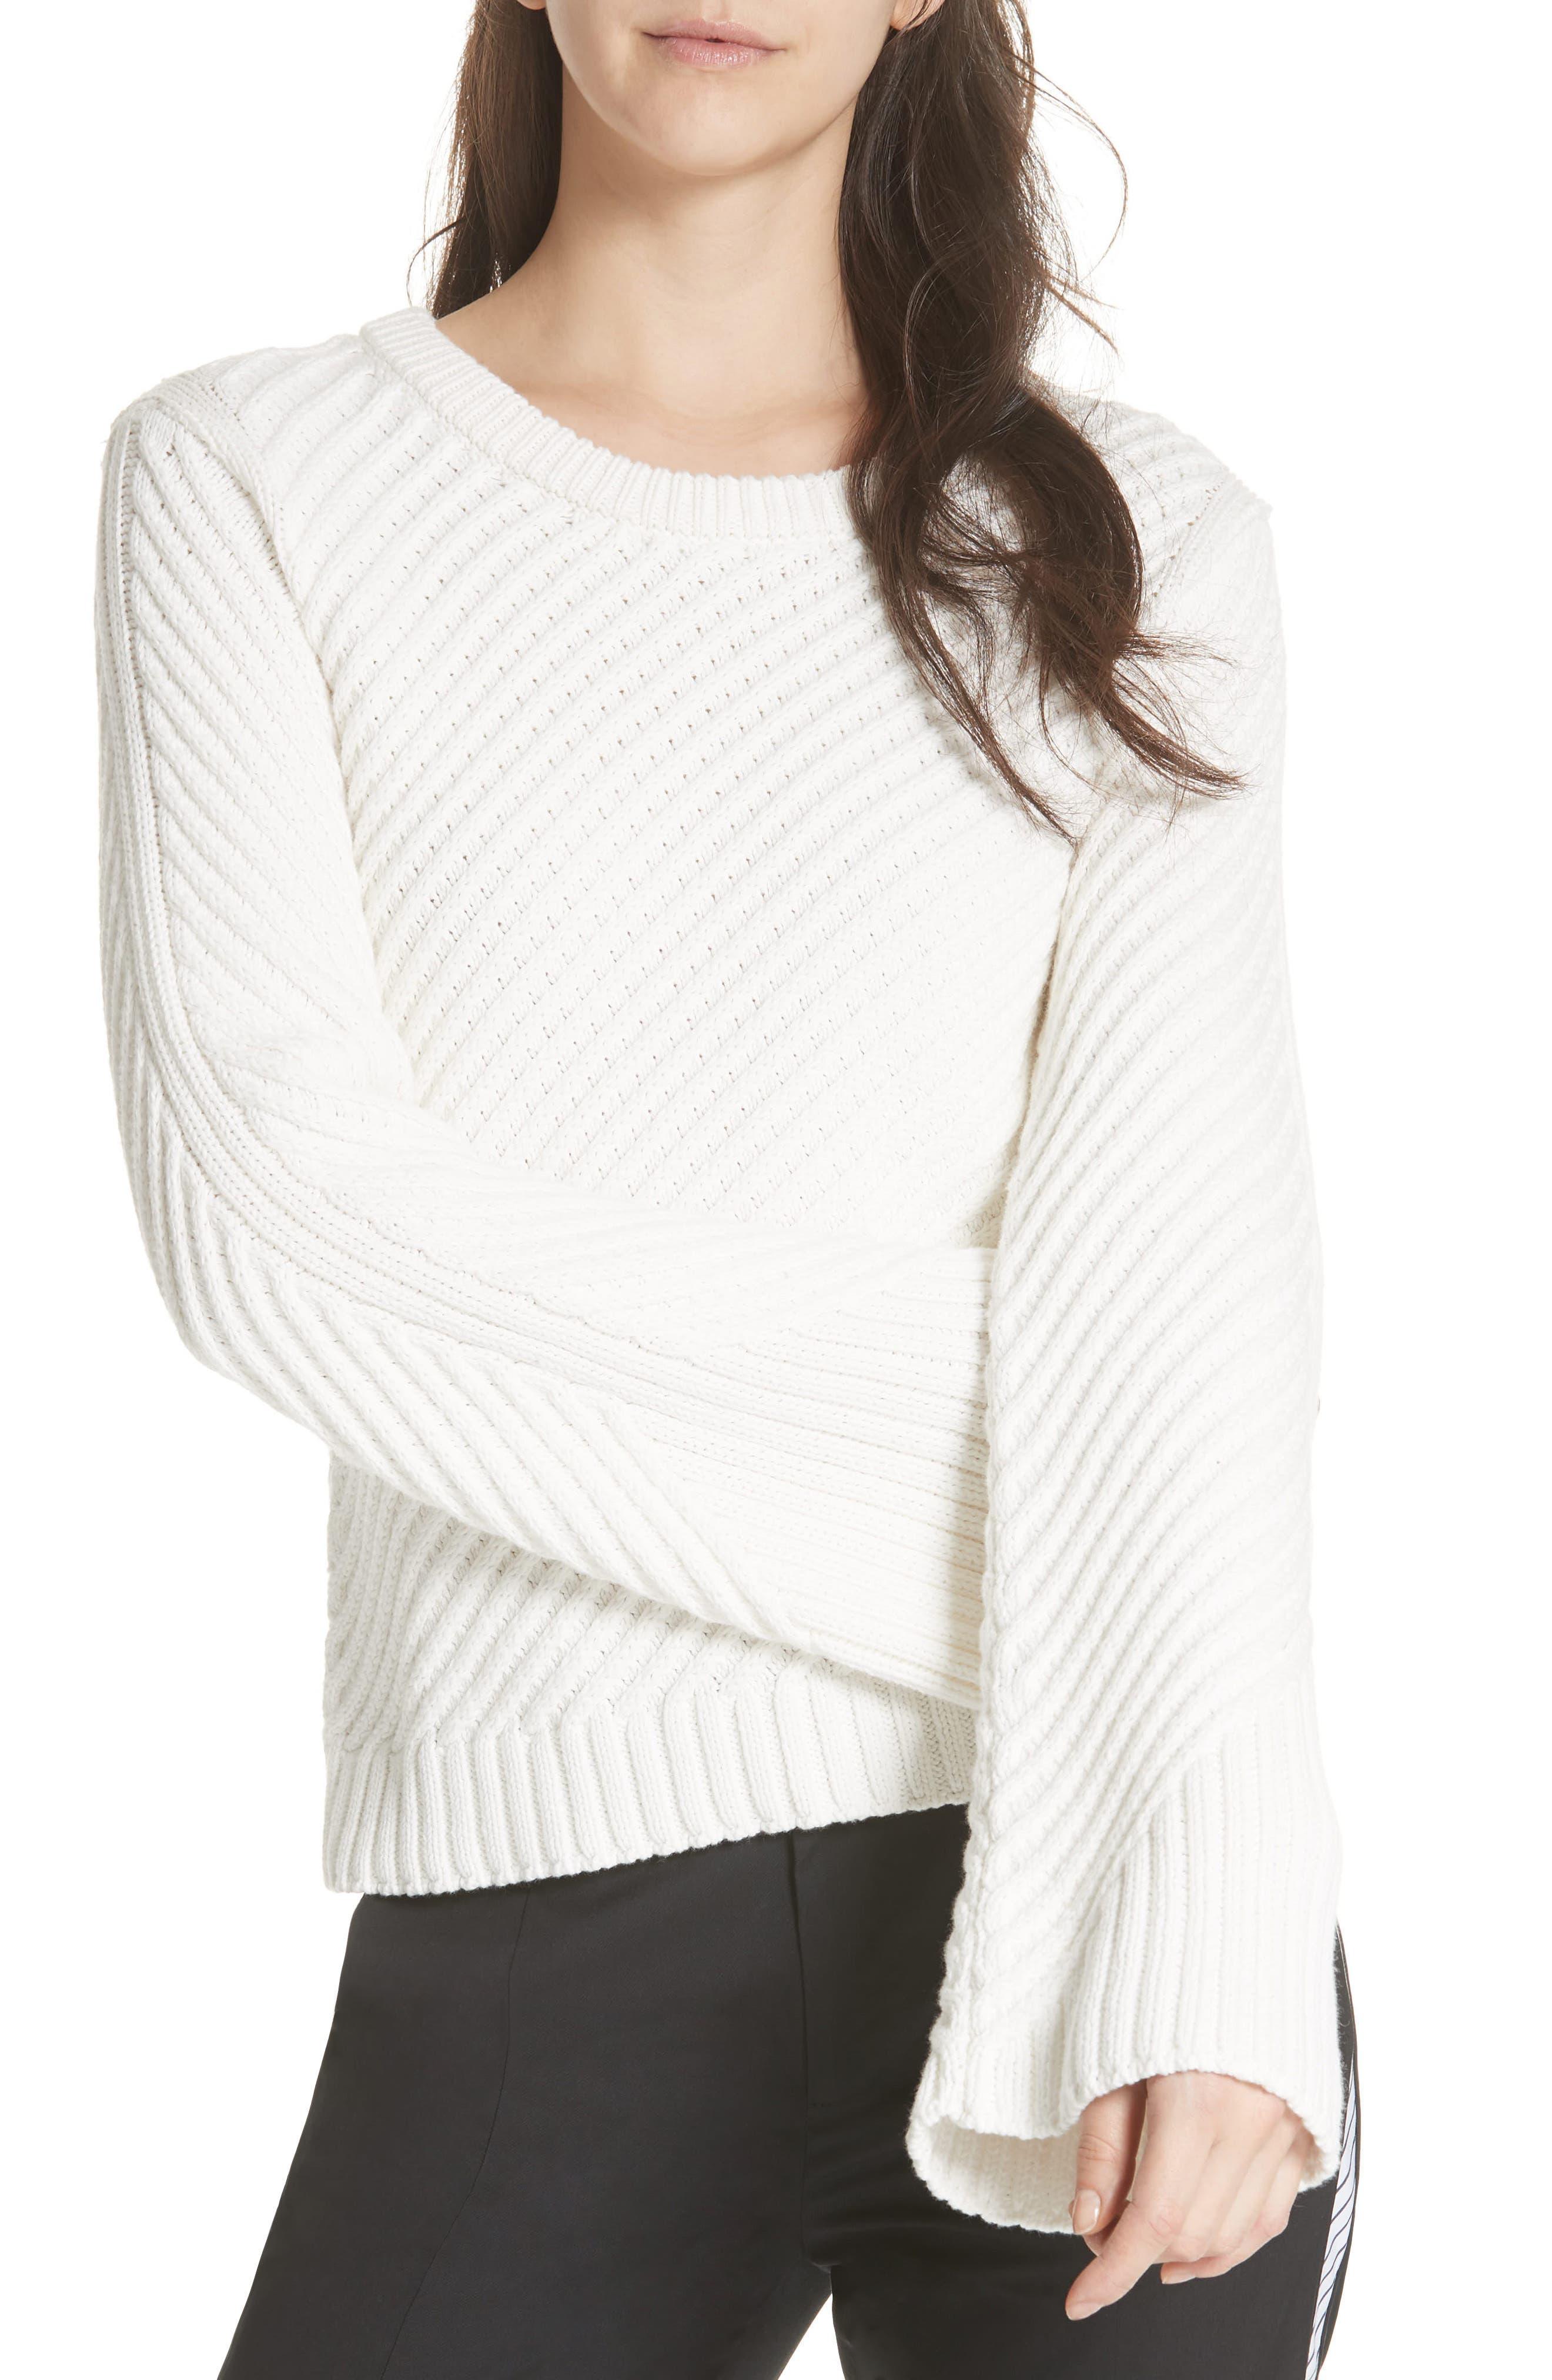 Lauraly Cutout Back Sweater,                             Main thumbnail 1, color,                             PORCELAIN